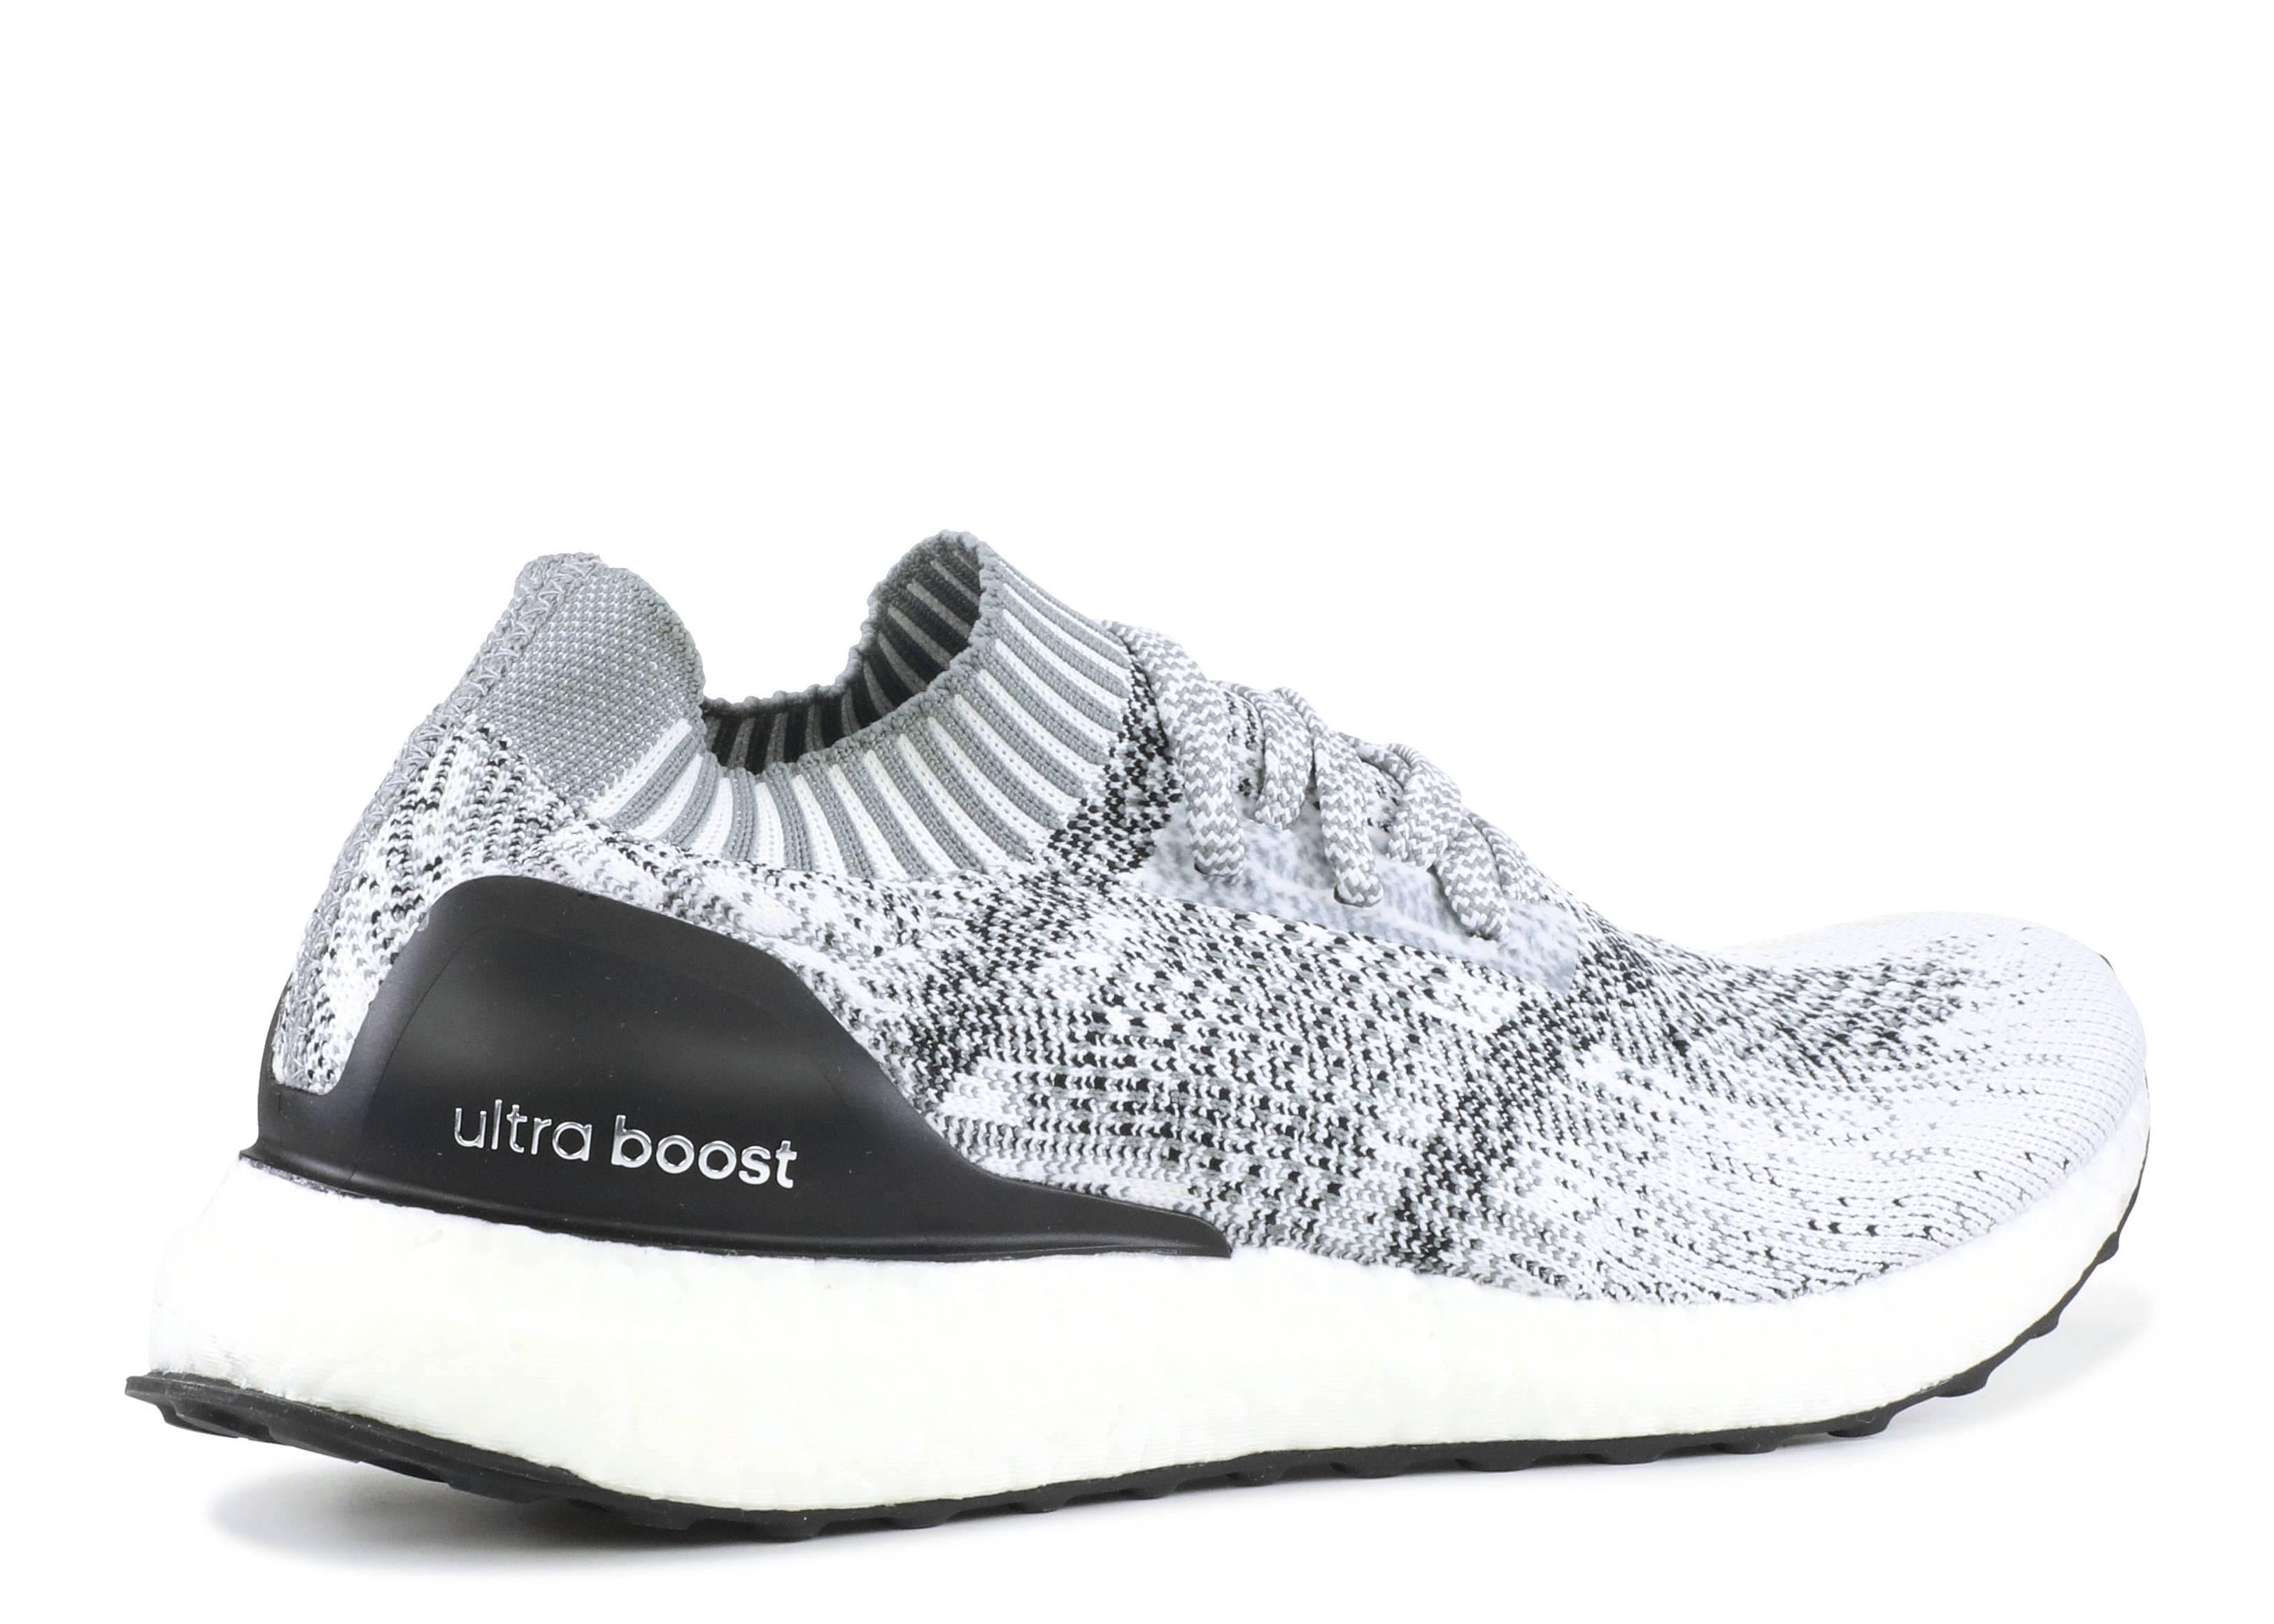 1cd73589cf064 Adidas UltraBOOST Uncaged